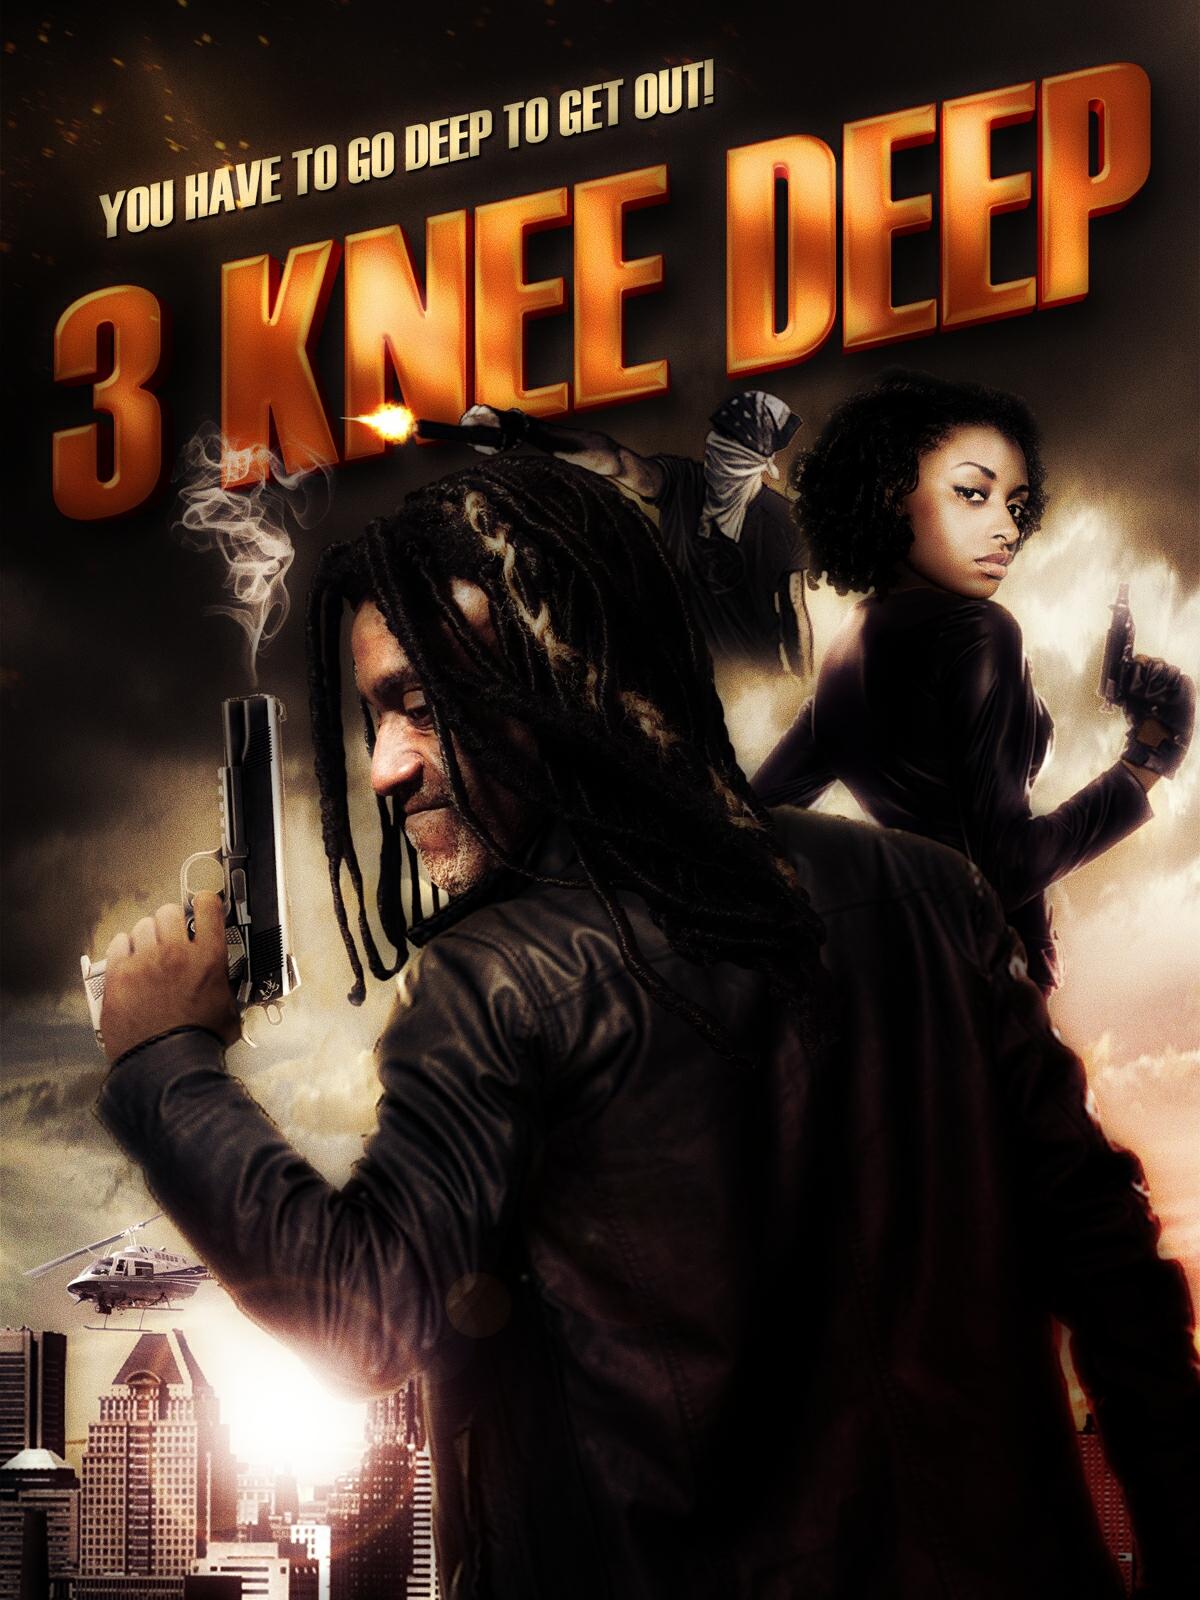 3kd poster variant